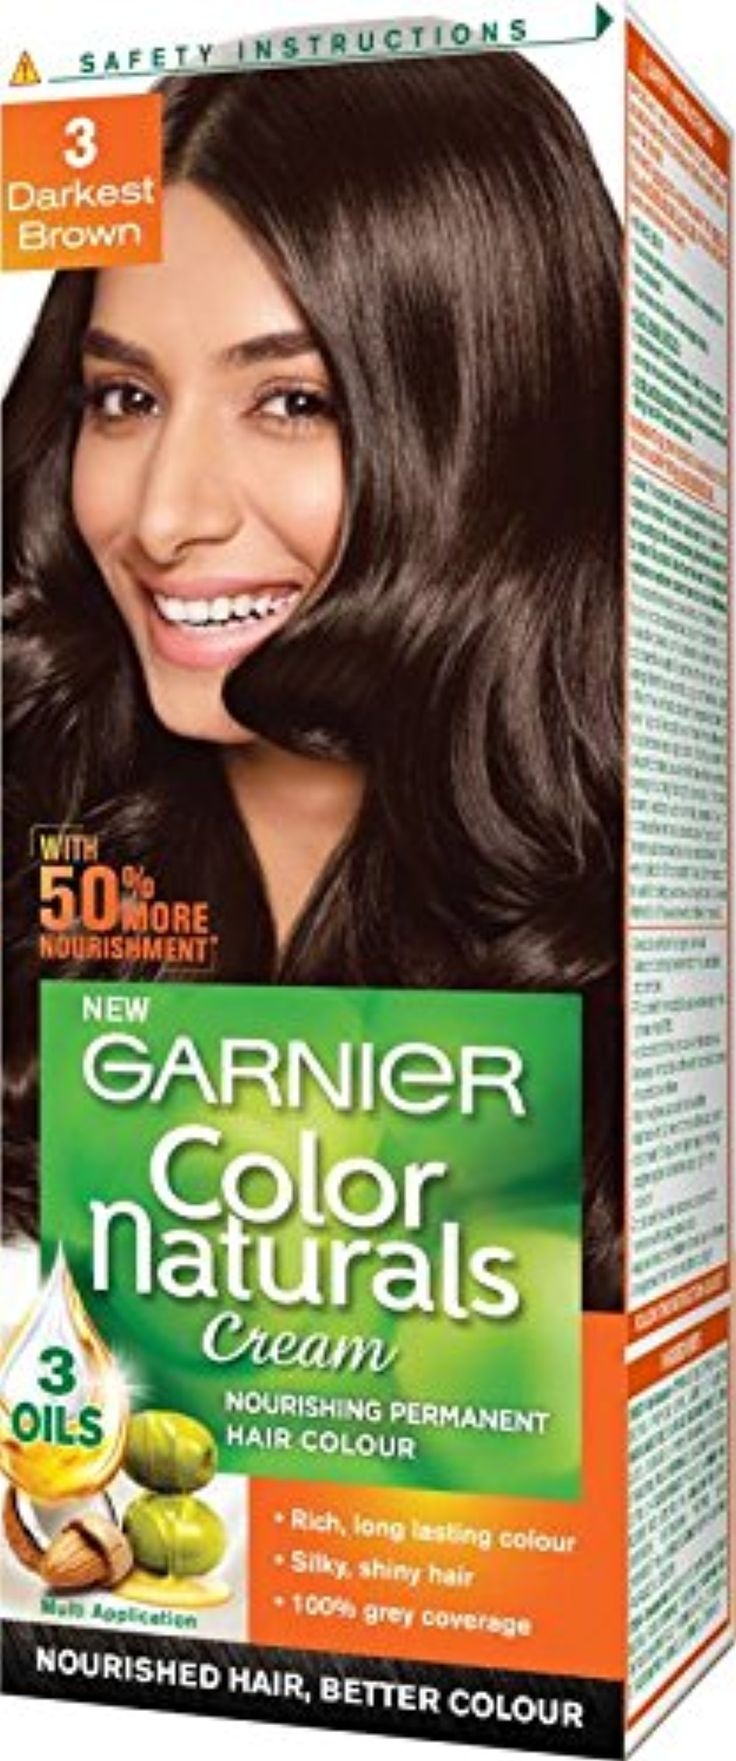 Garnier New Color Naturals Hair Color (Darkest Brown 3) packing may ...